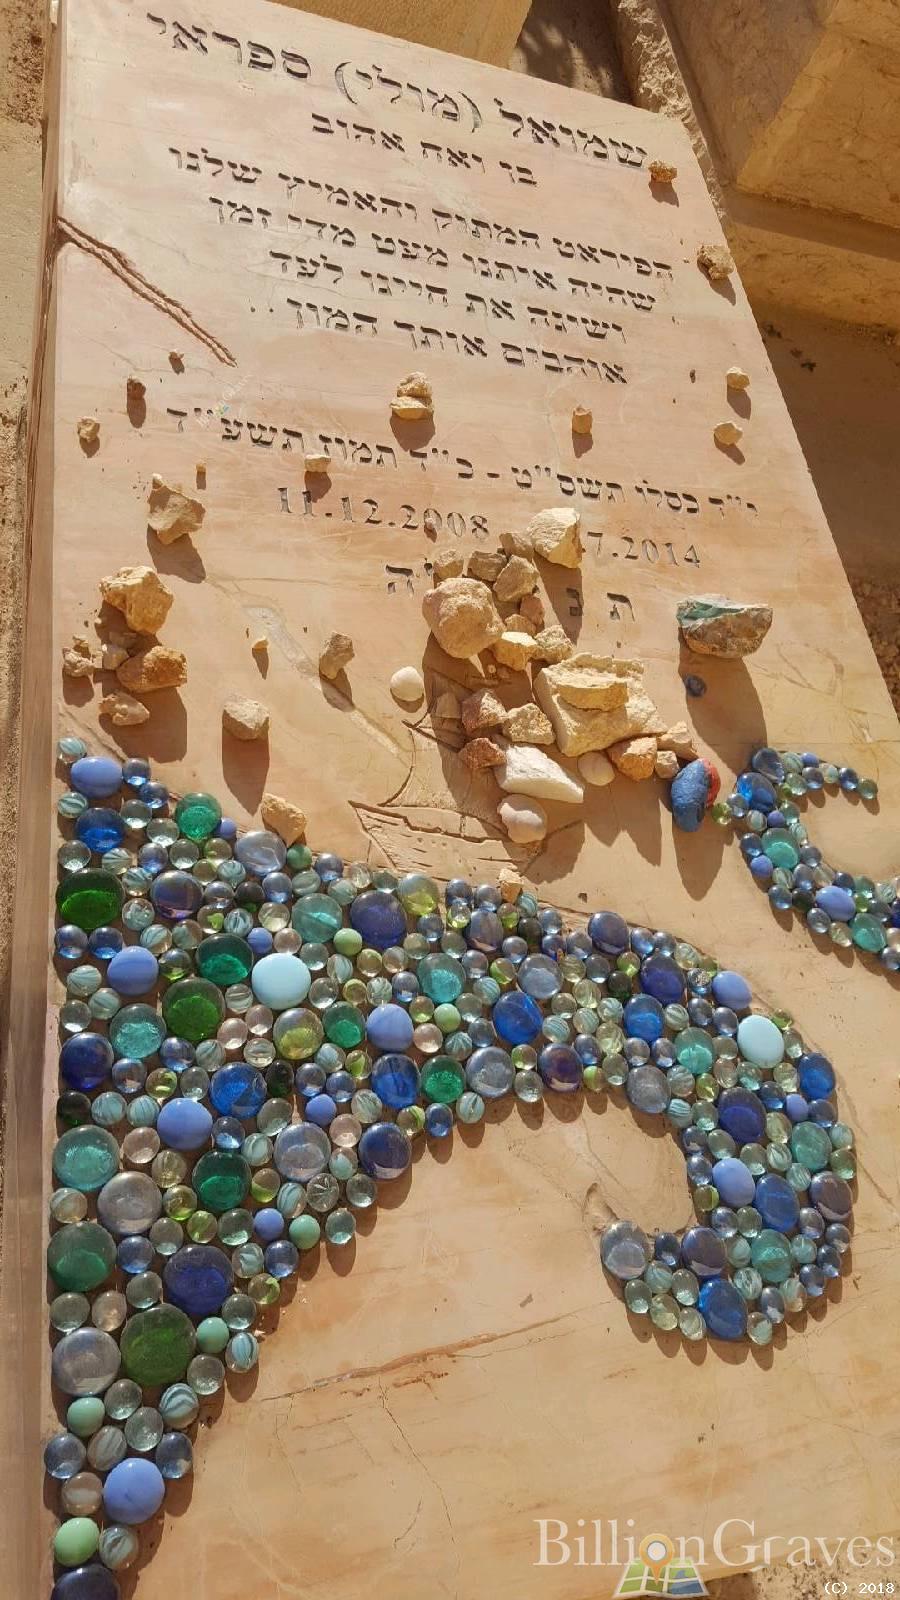 BillionGraves, Jewish, genealogy, family history, GPS, BillionGraves app, Israel, Jew, Hebrew, cemetery, grave, gravestone, sea, ocean, water, rocks